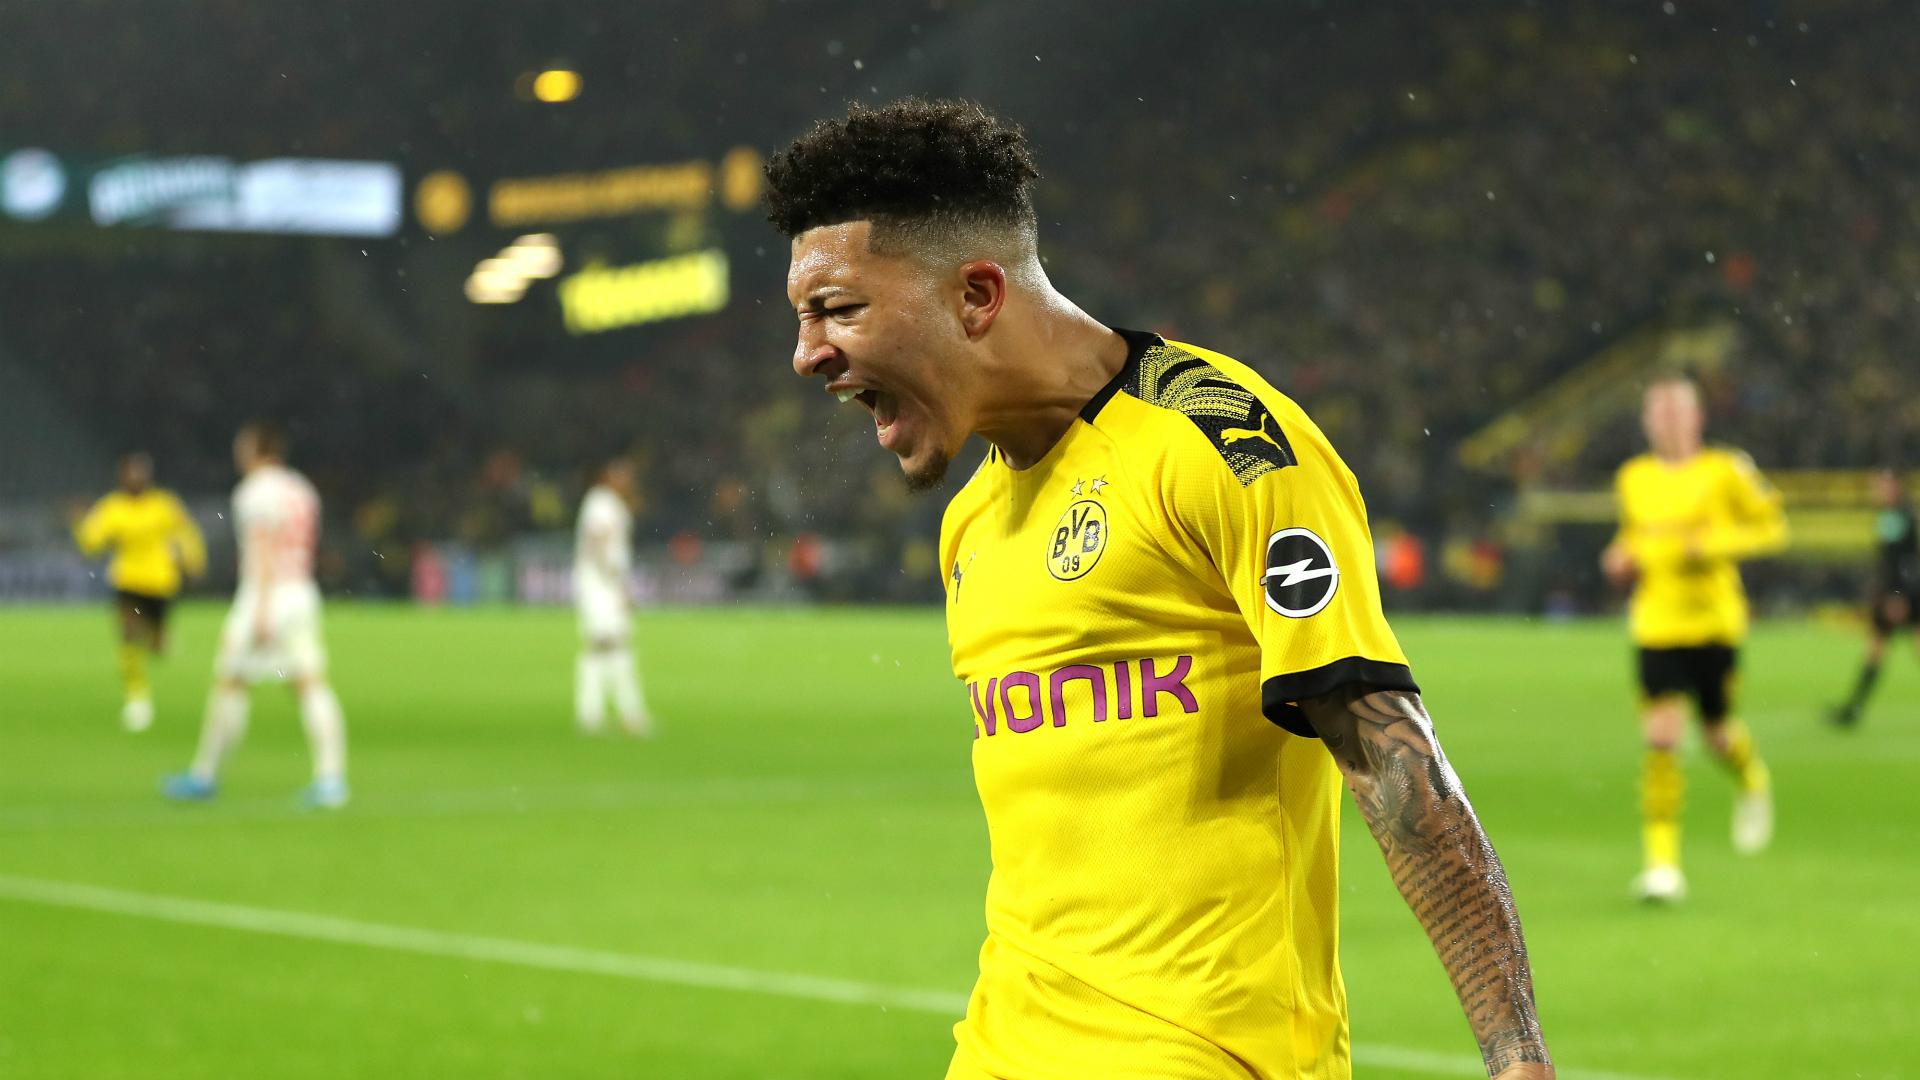 Mario Gotze to leave Borussia Dortmund at end of season